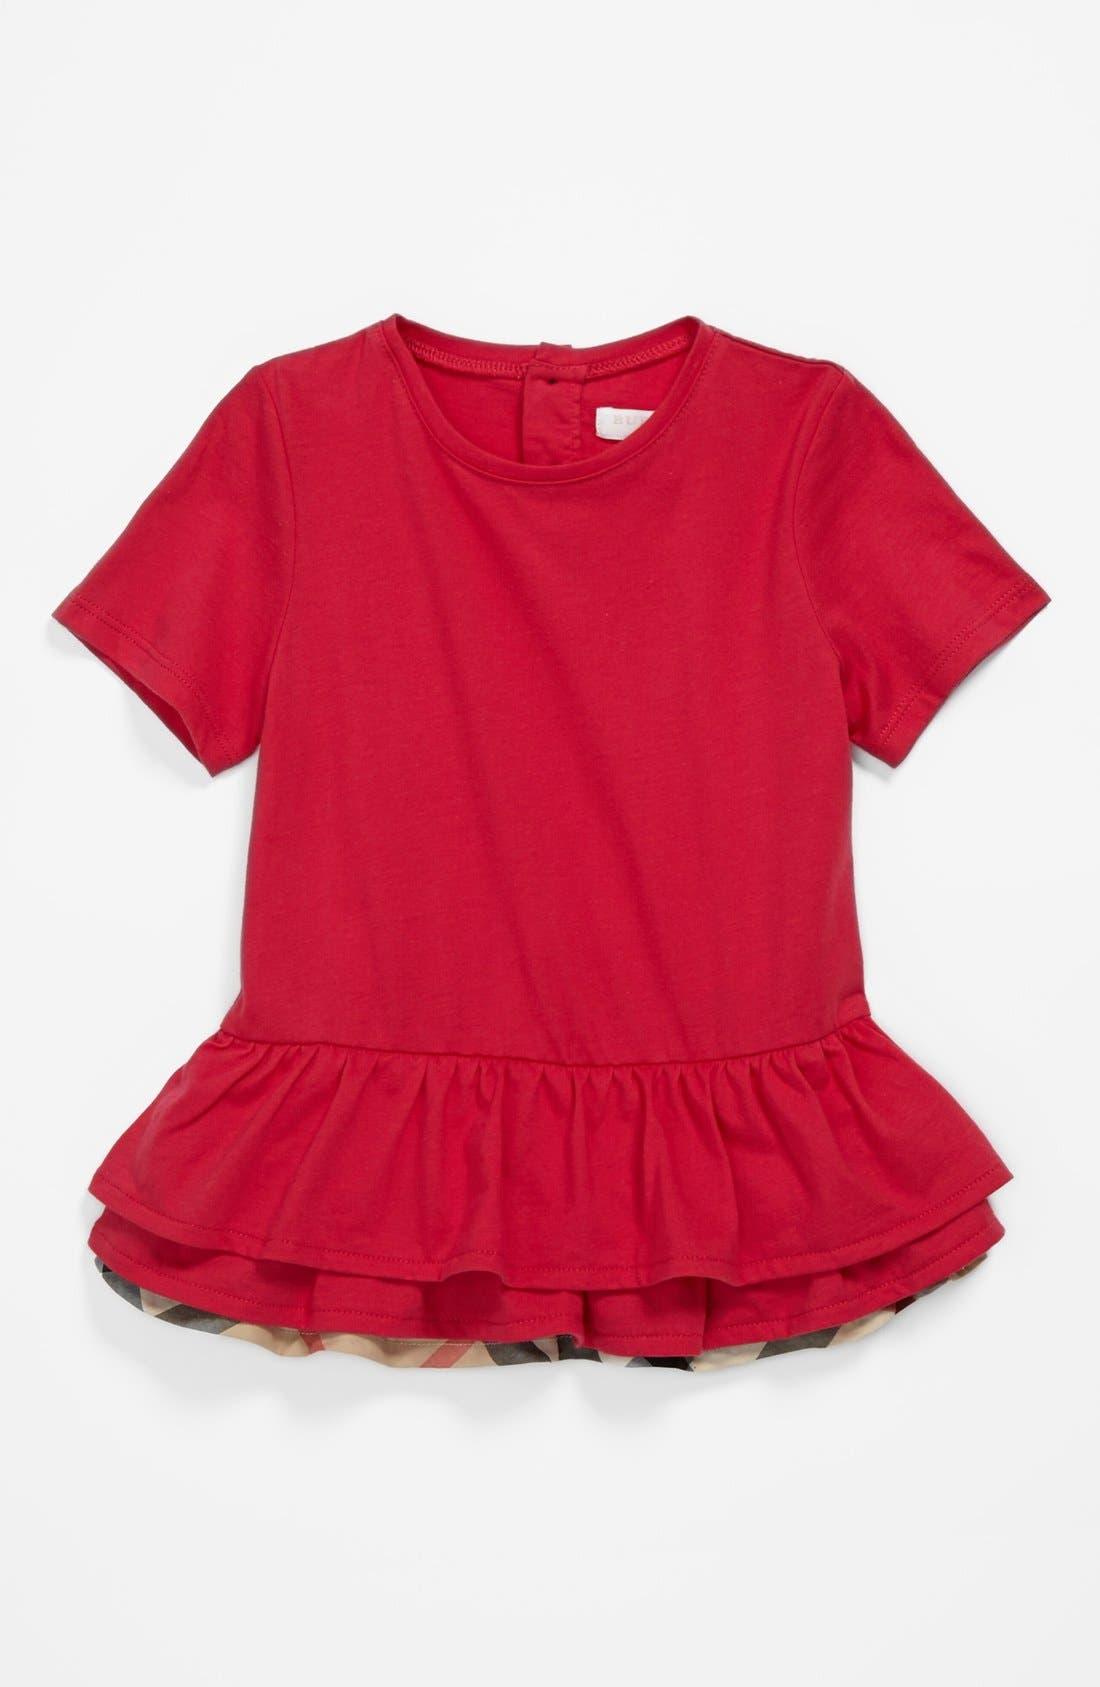 Alternate Image 1 Selected - Burberry 'Mini Tyna' Tiered Ruffle Hem Top (Baby Girls)